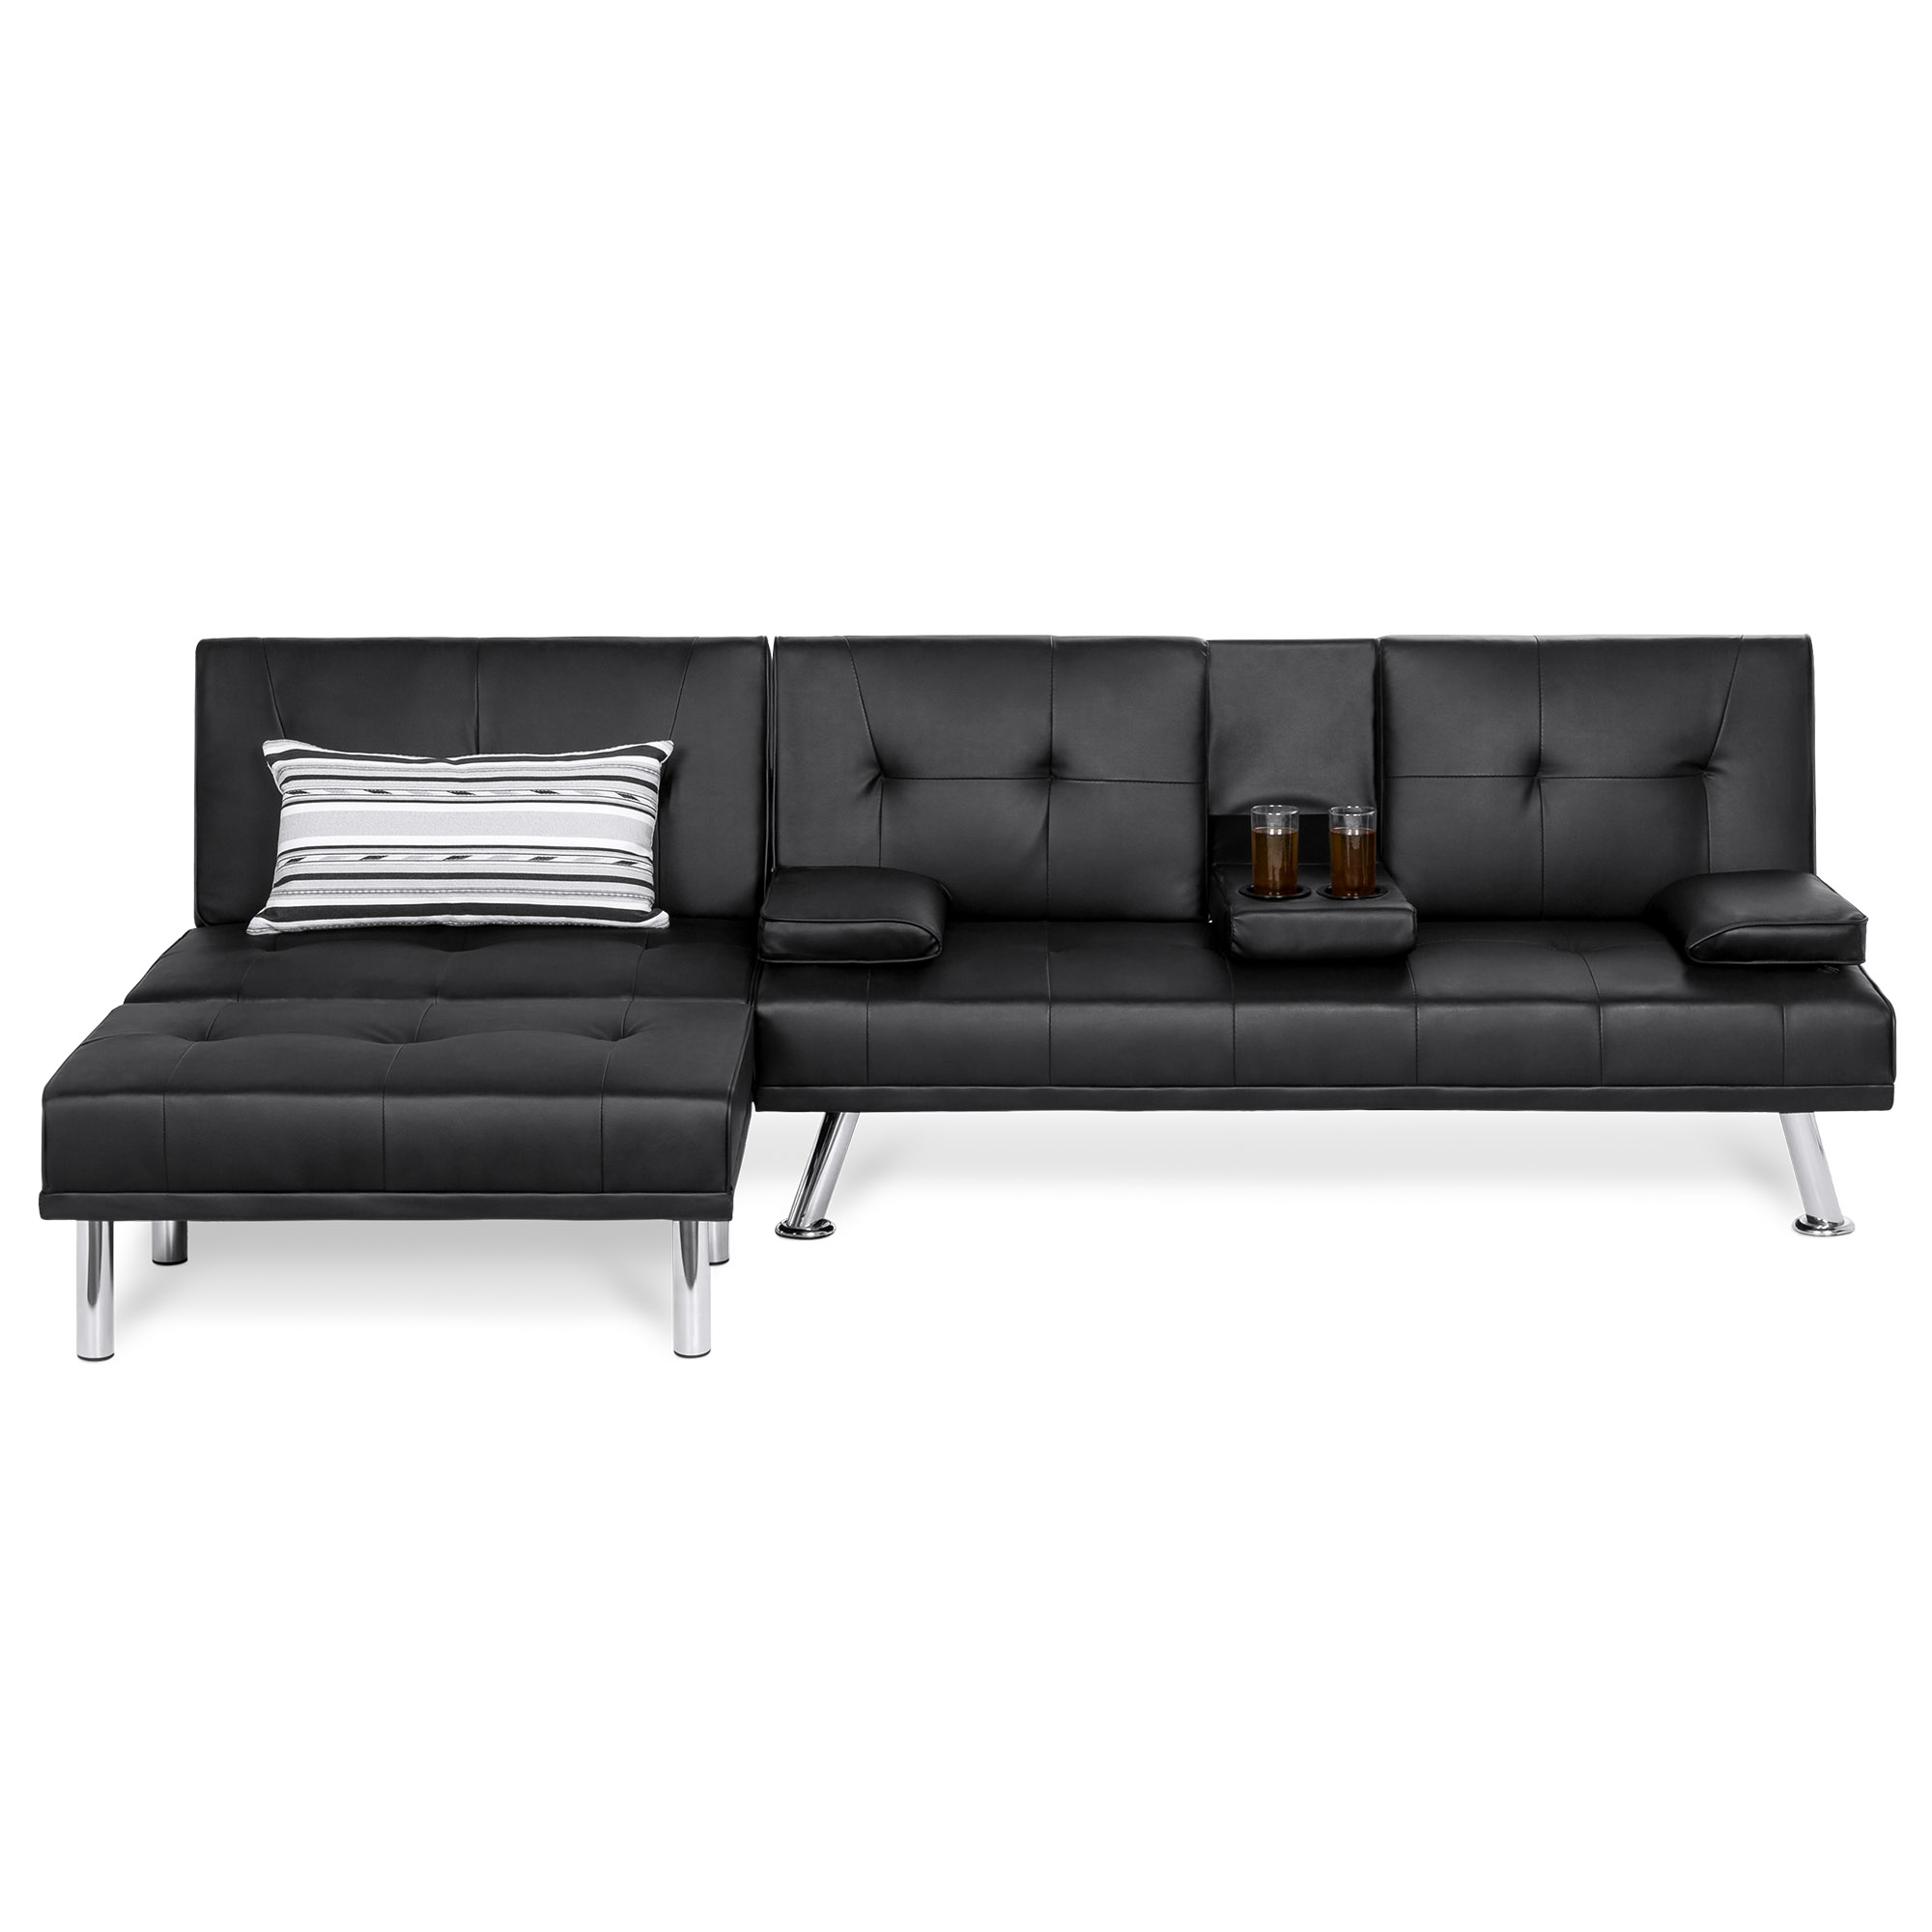 Best Choice Products 3-Piece Modular Modern Living Room Sofa ...